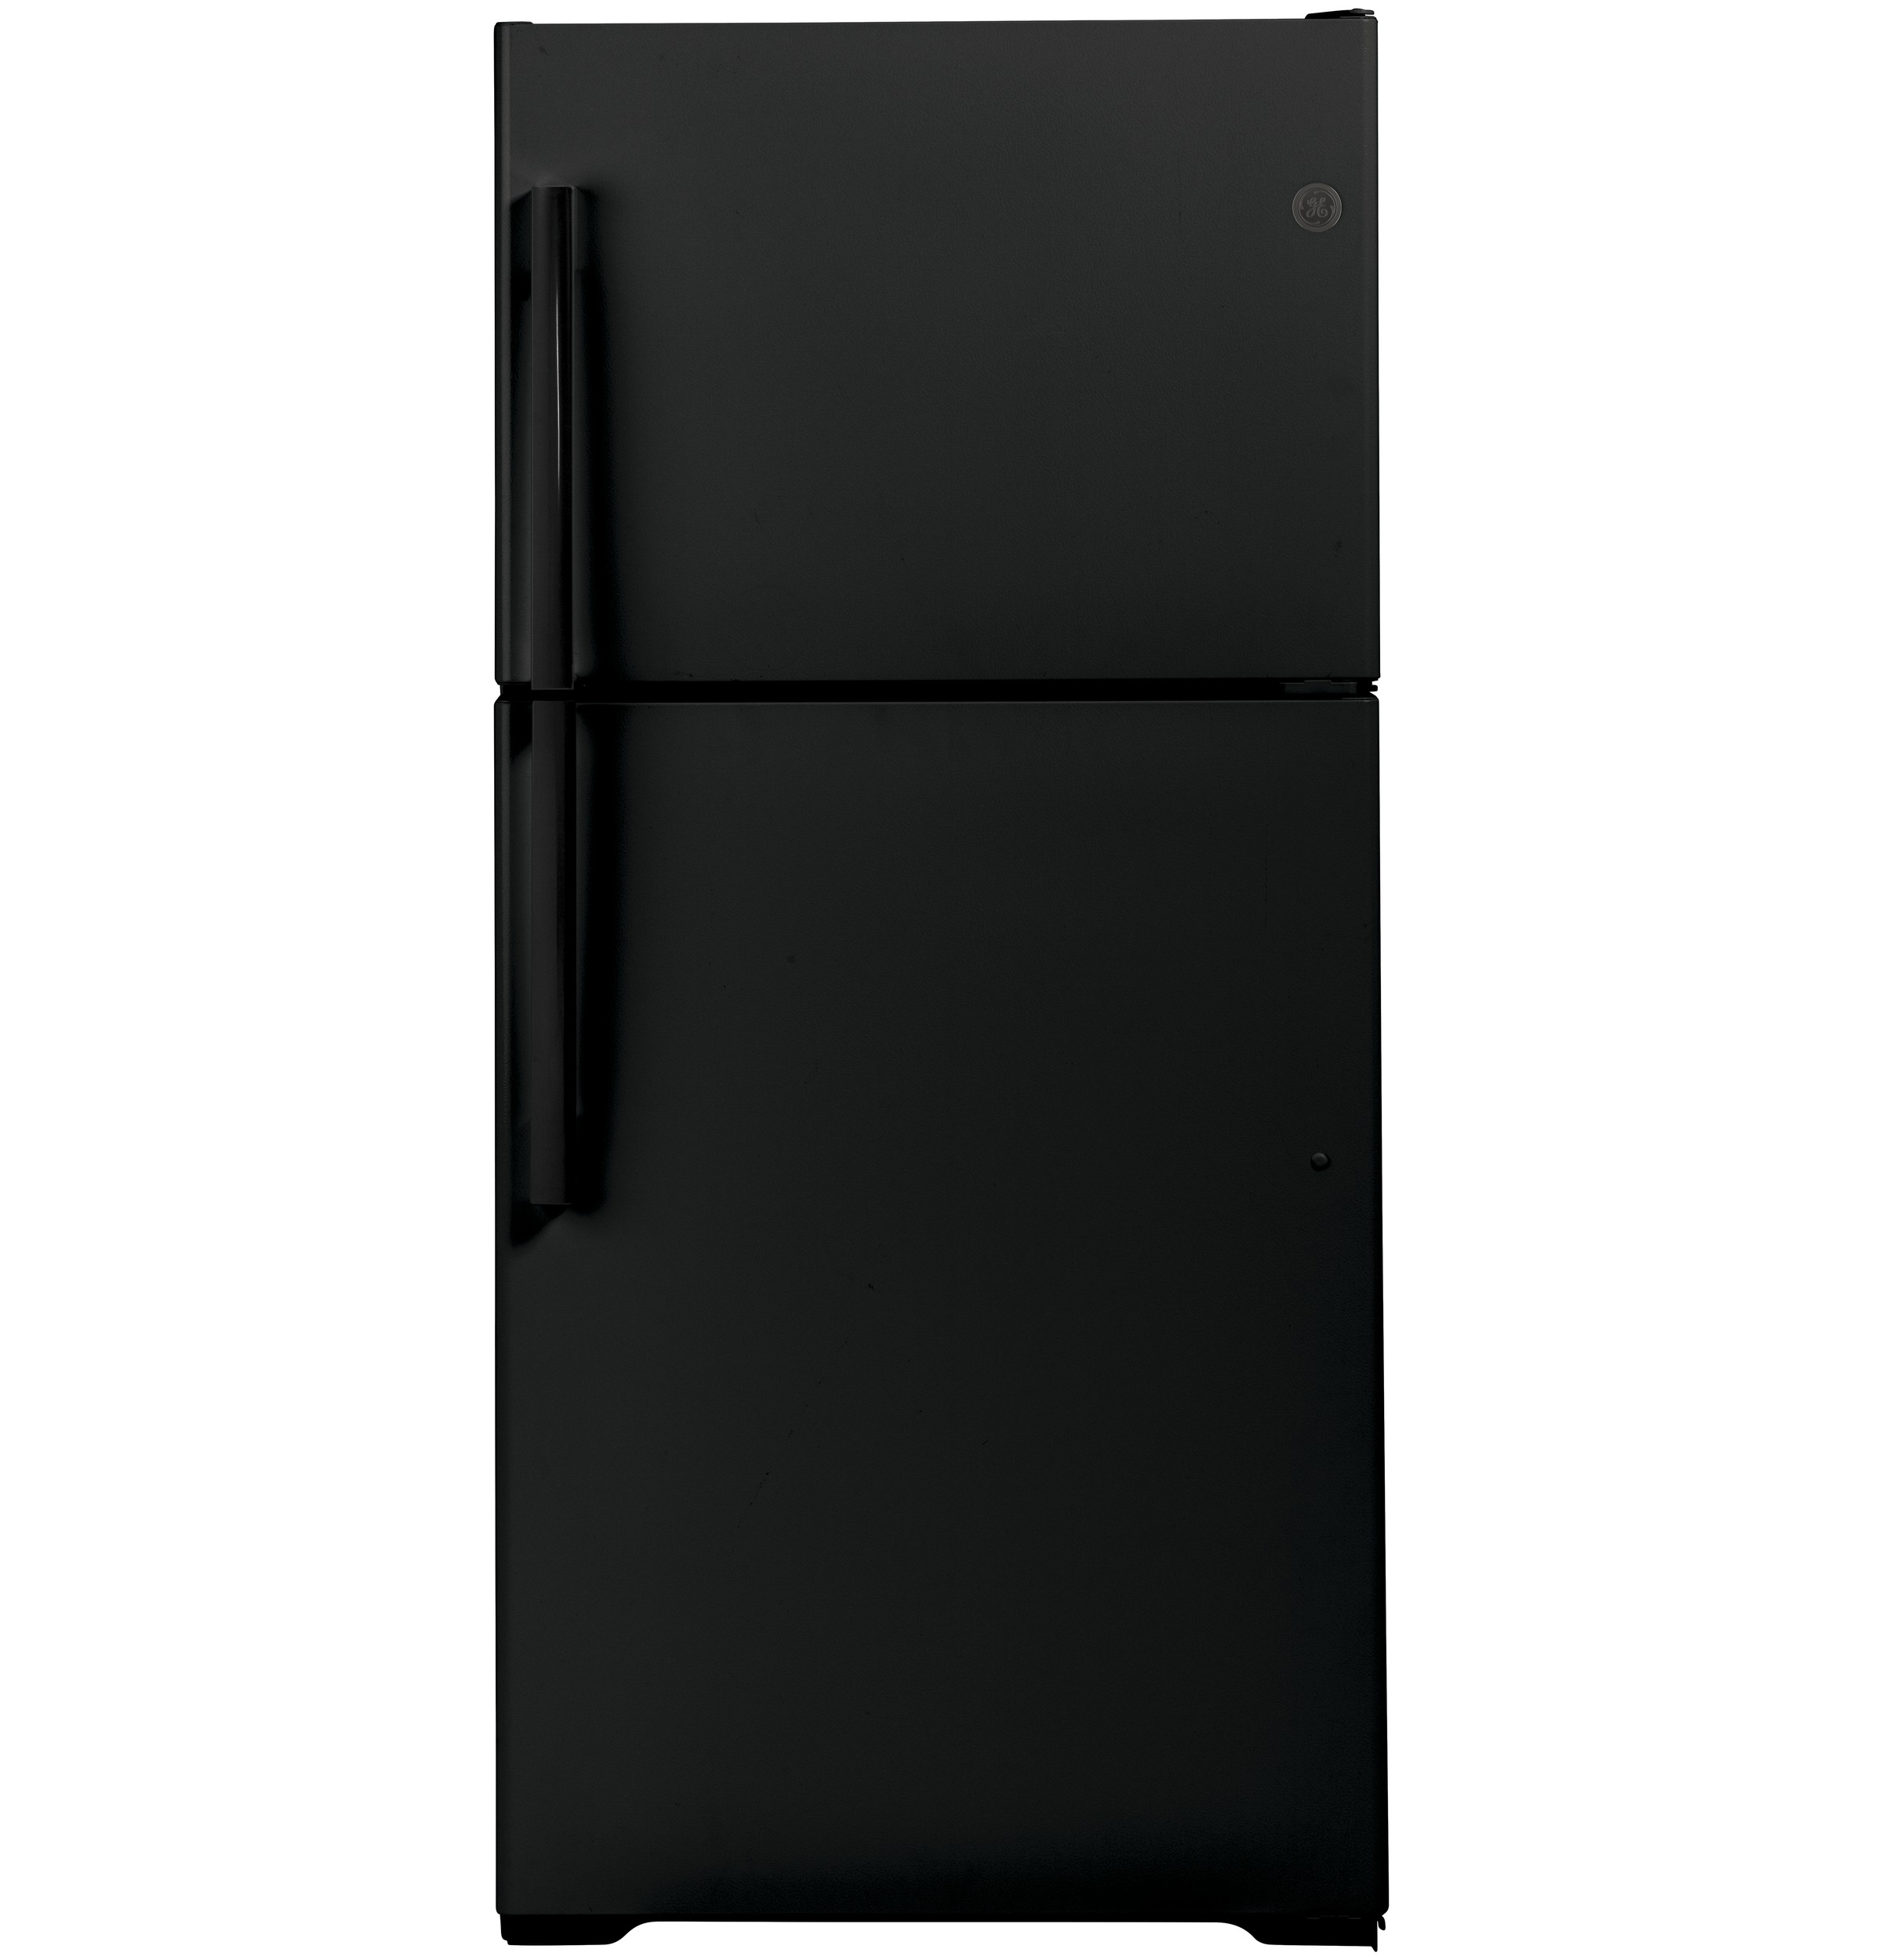 GE GE® ENERGY STAR® 19.2 Cu. Ft. Top-Freezer Refrigerator